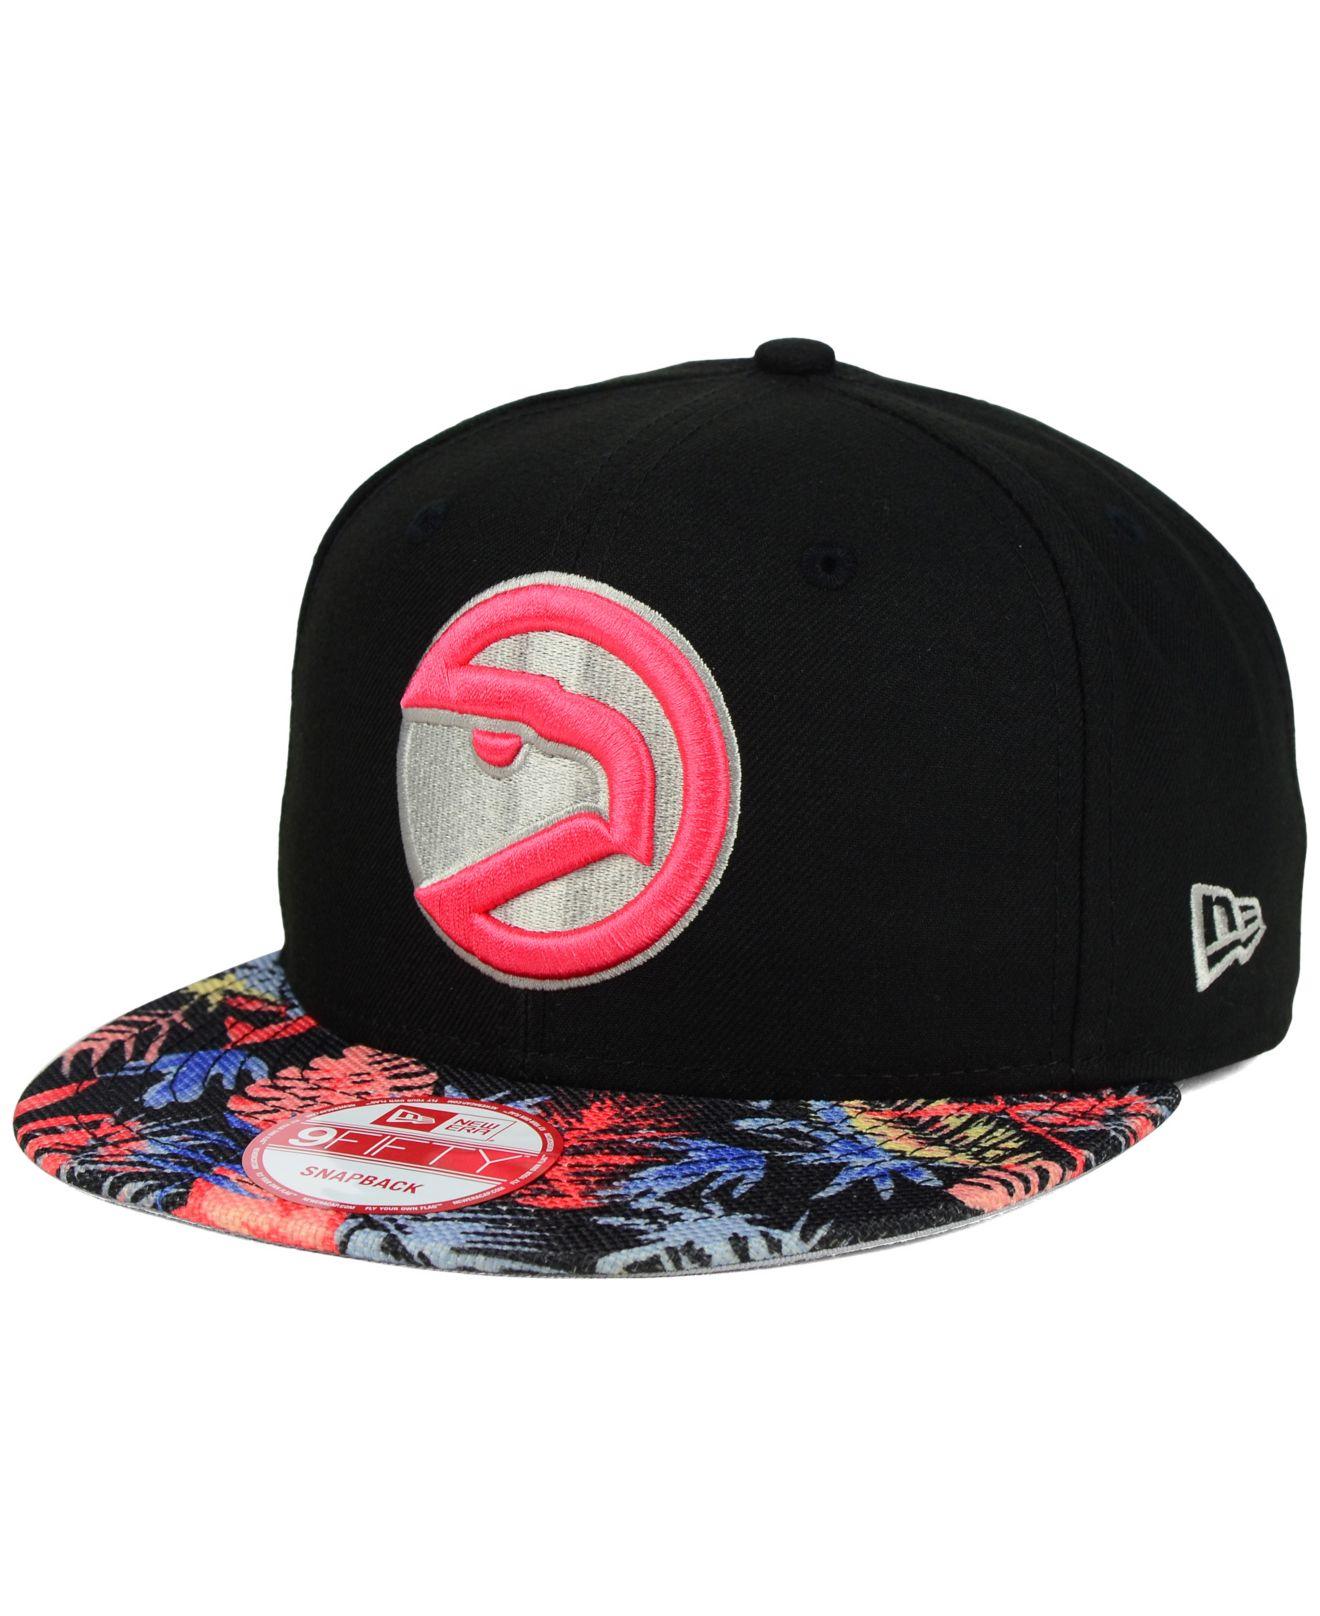 sale retailer 66143 836c7 ... best price lyst ktz atlanta hawks fall floral 9fifty snapback cap for  men a11c9 5b542